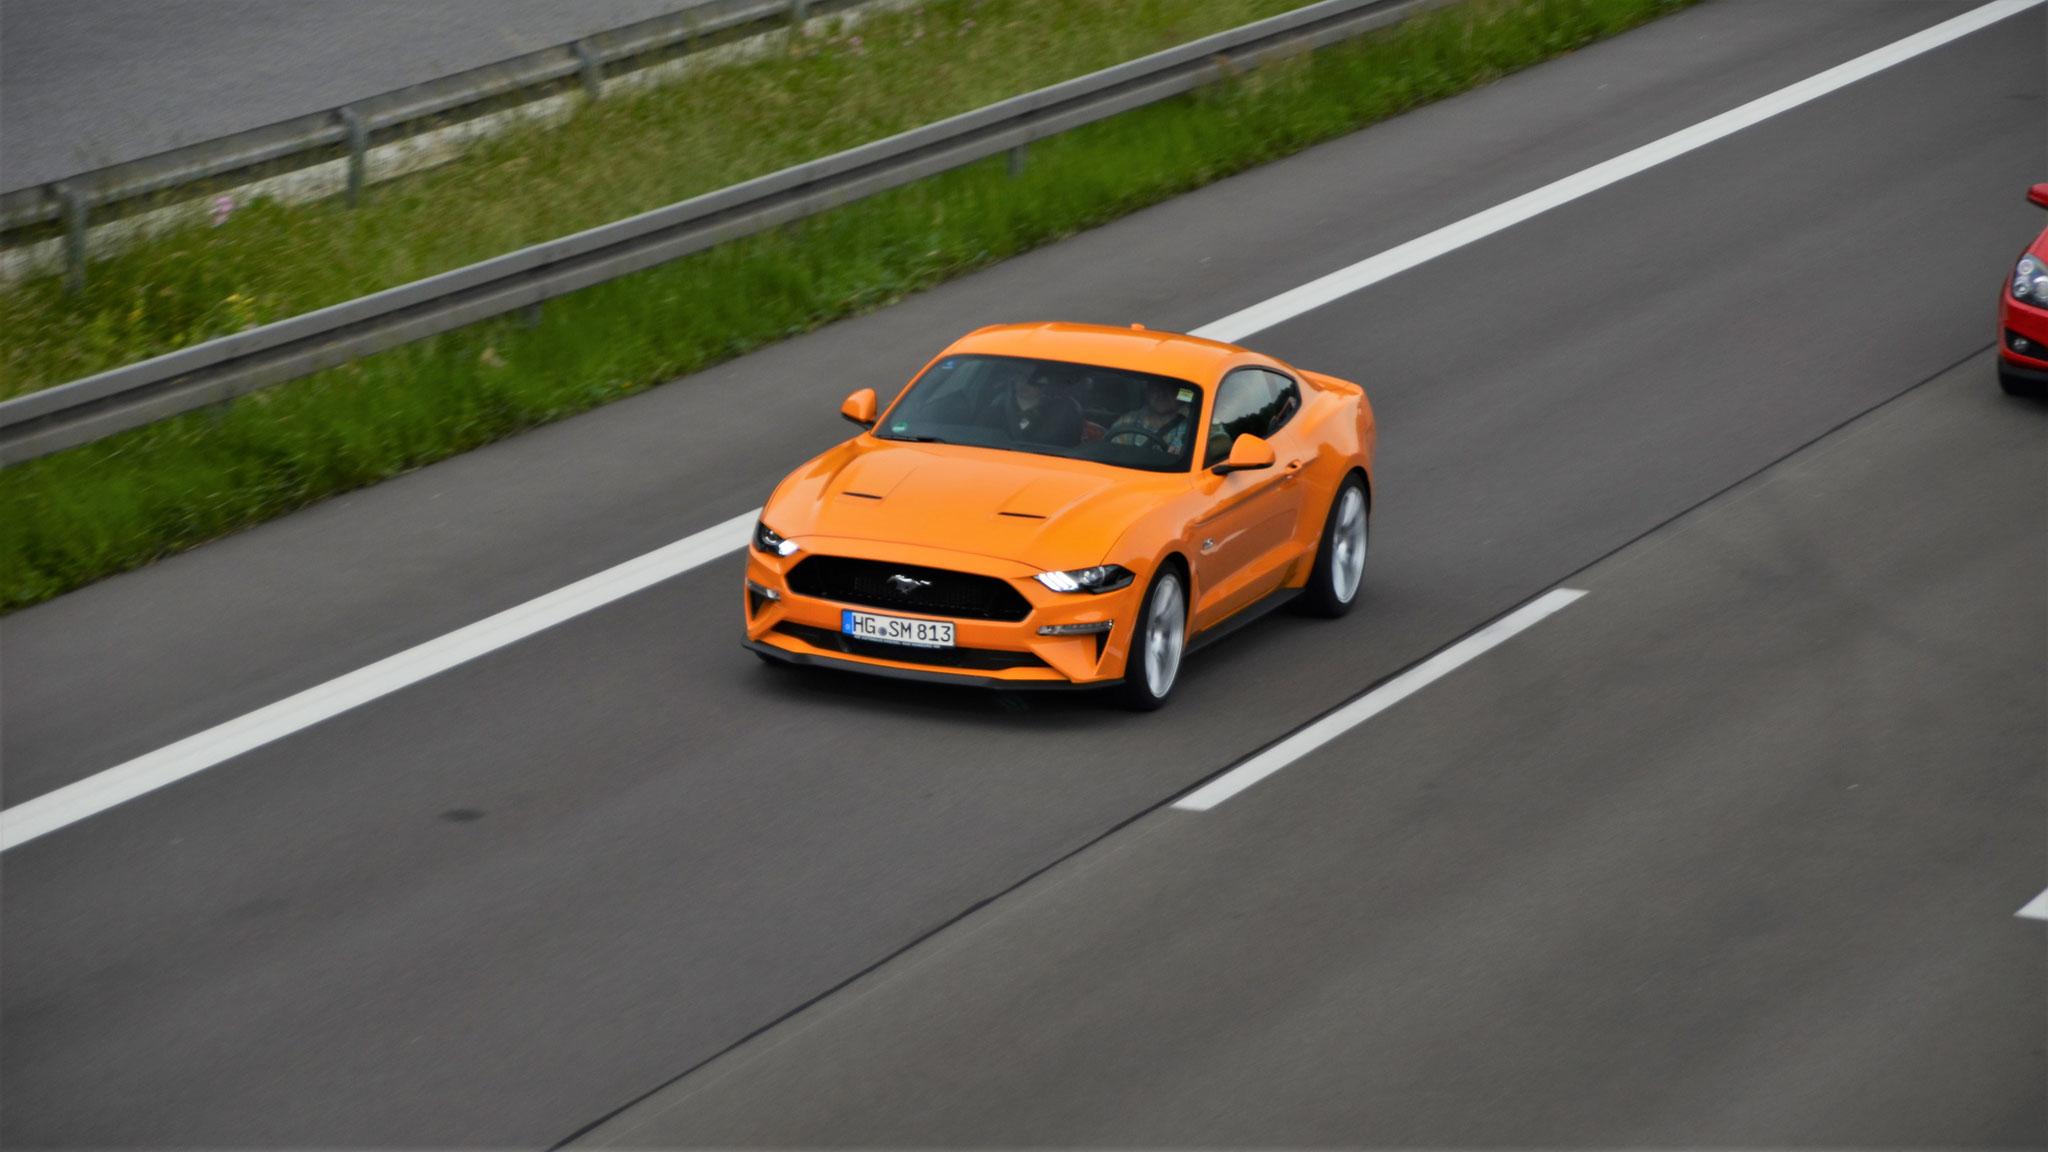 Ford Mustang GT - HG-SM-813